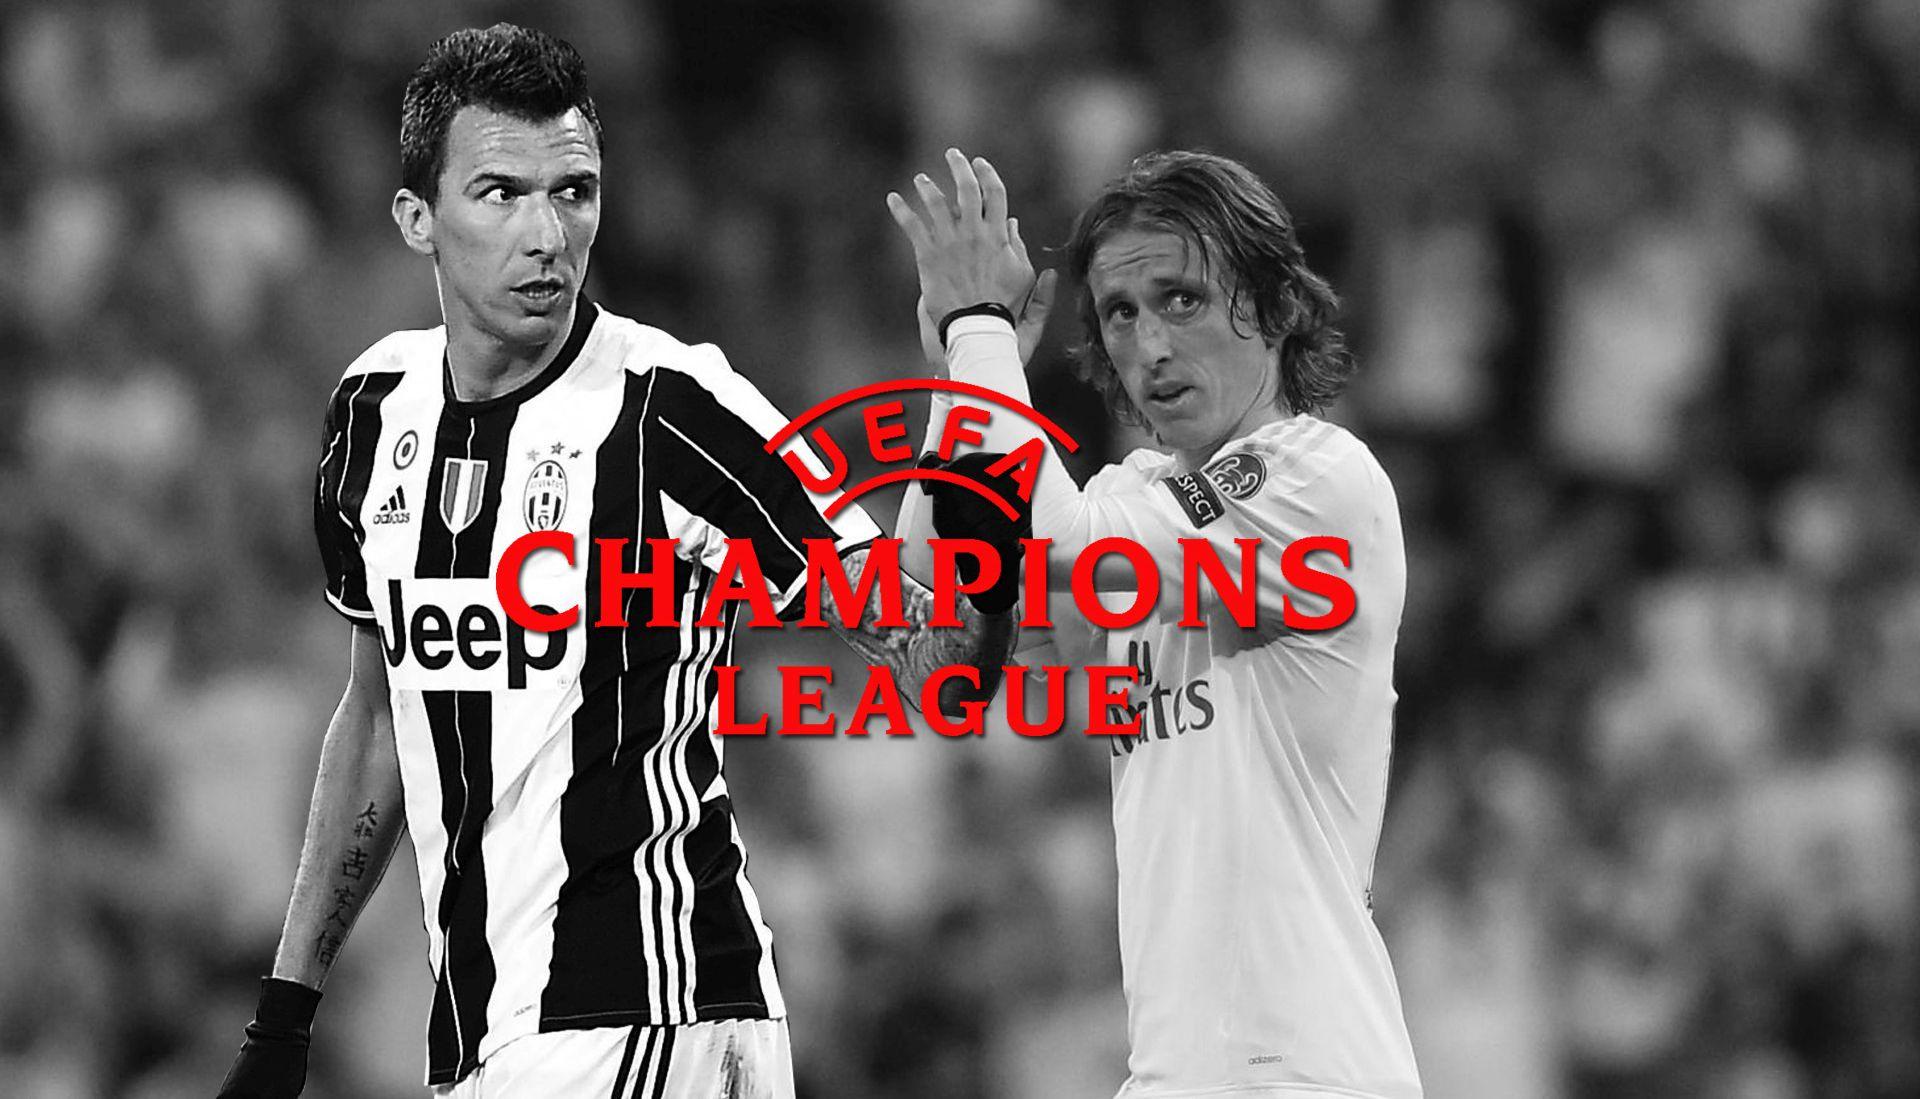 UŽIVO: Real i Ronaldo obranili naslov prvaka (4:1)